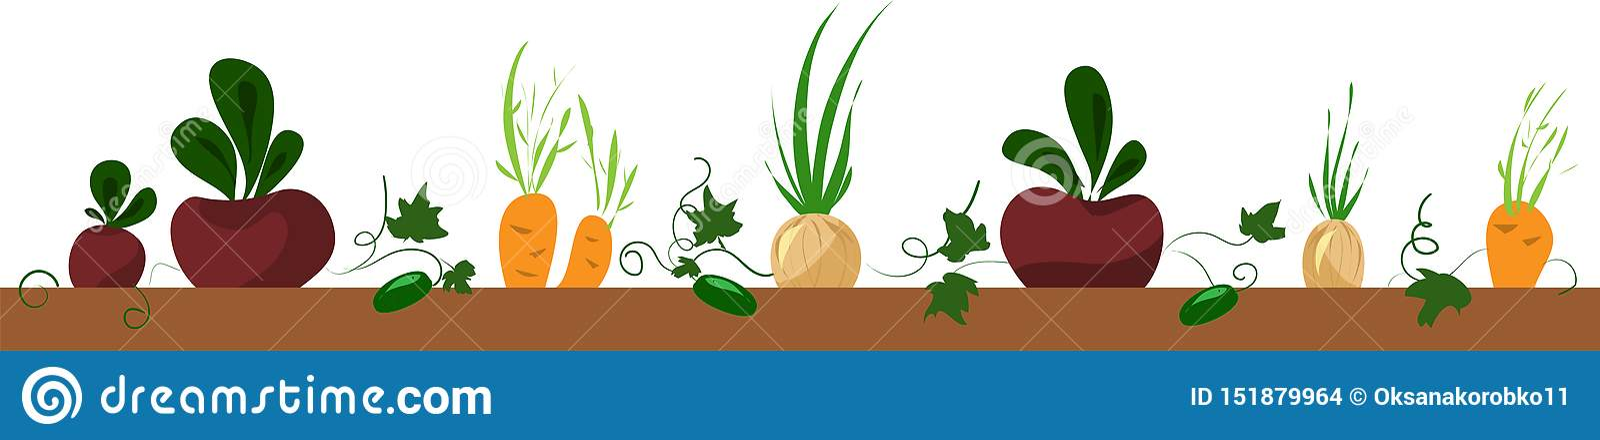 Cama vegetal, marco con la remolacha, zanahoria, cebolla